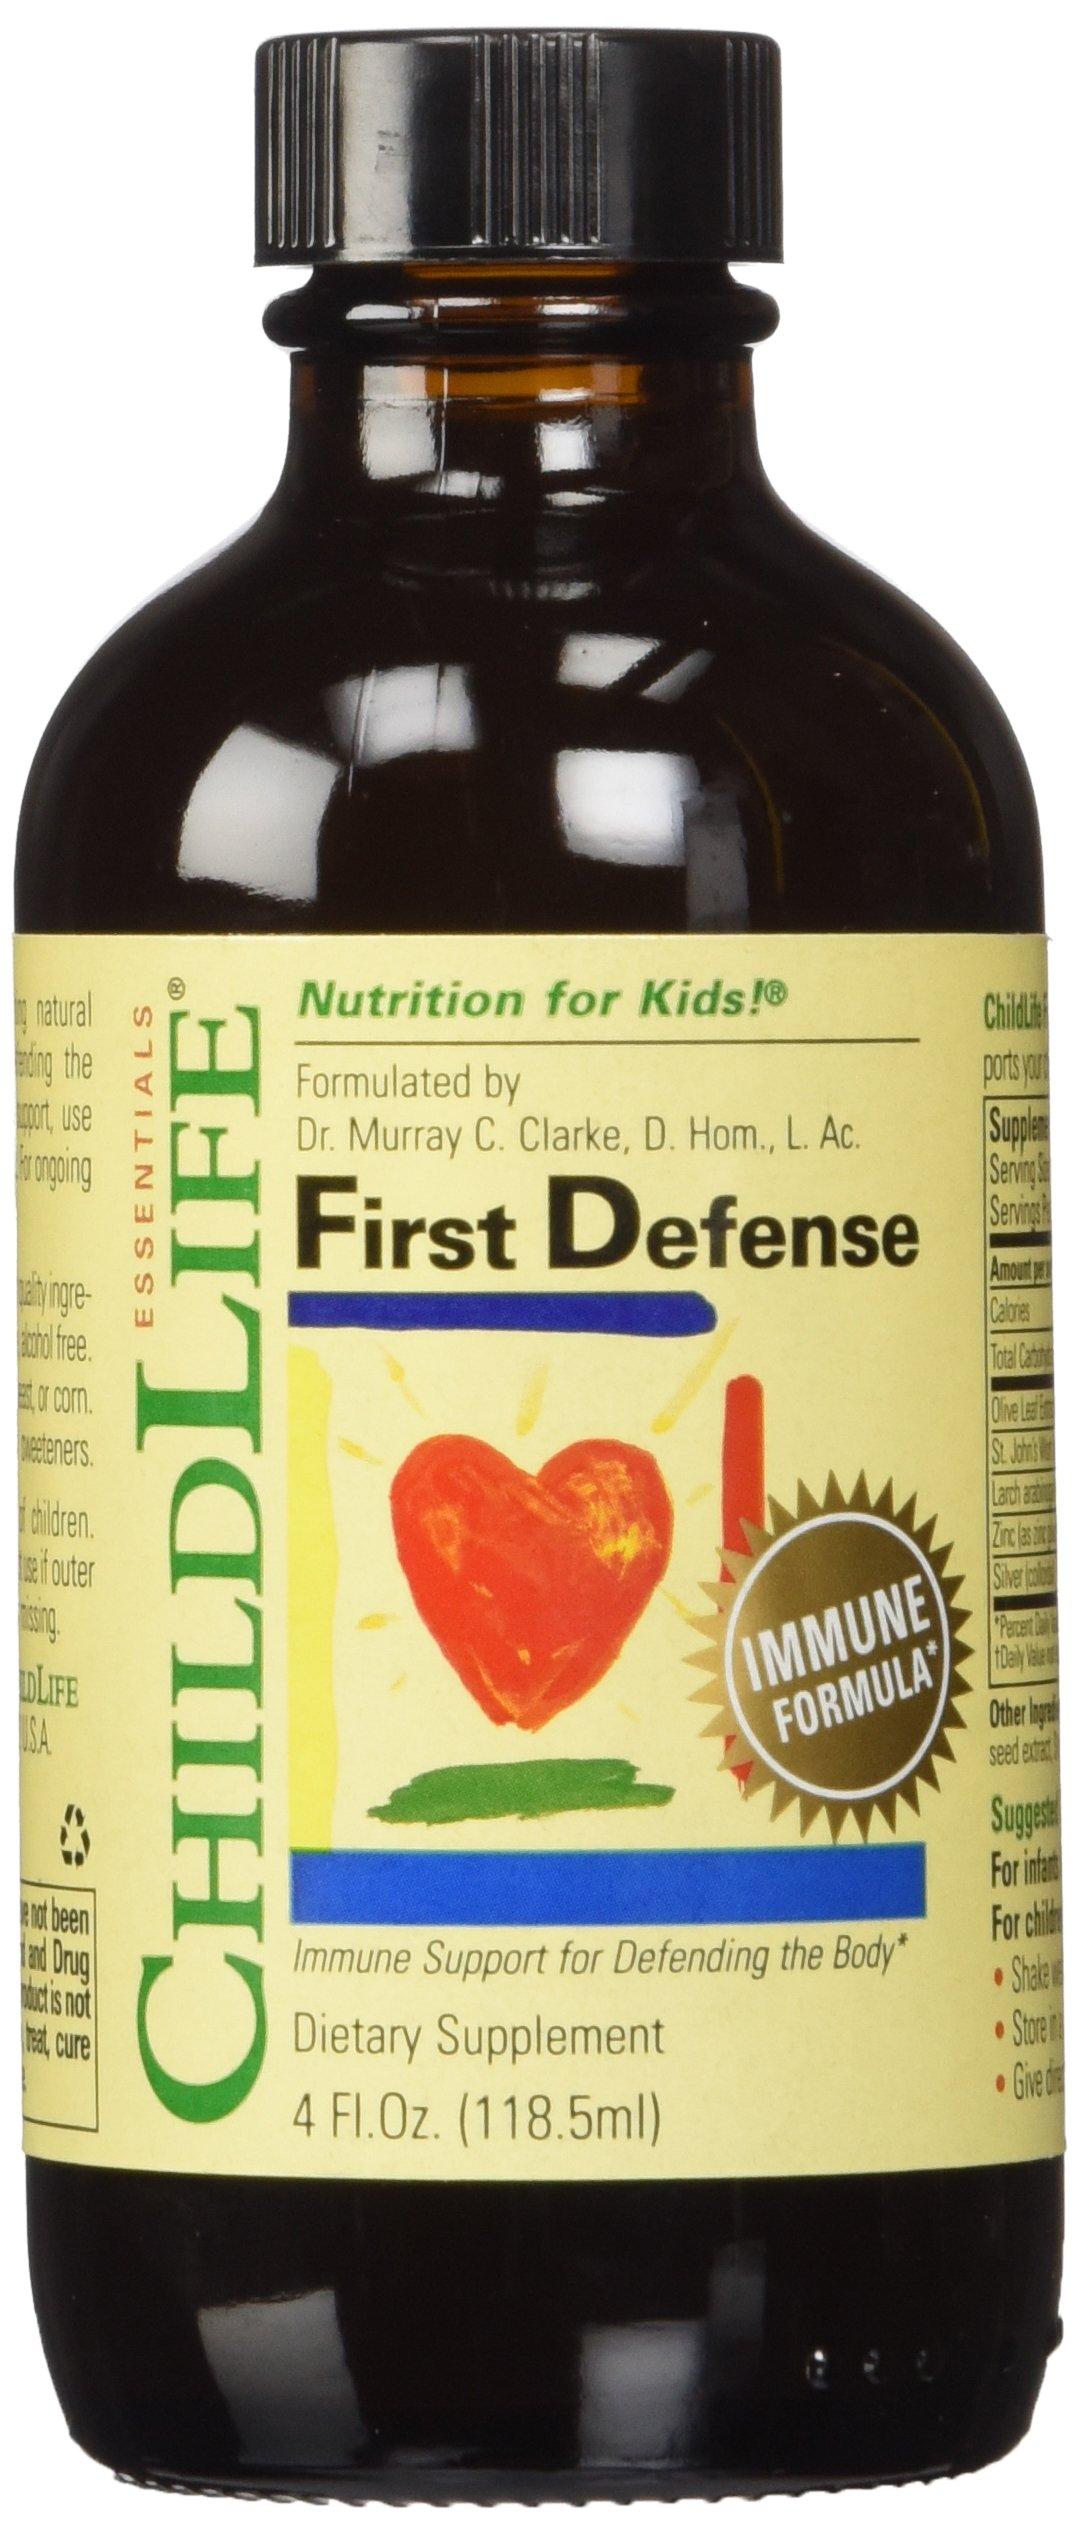 ChildLife First Defense 4 oz (2 Pack), Total 8 oz